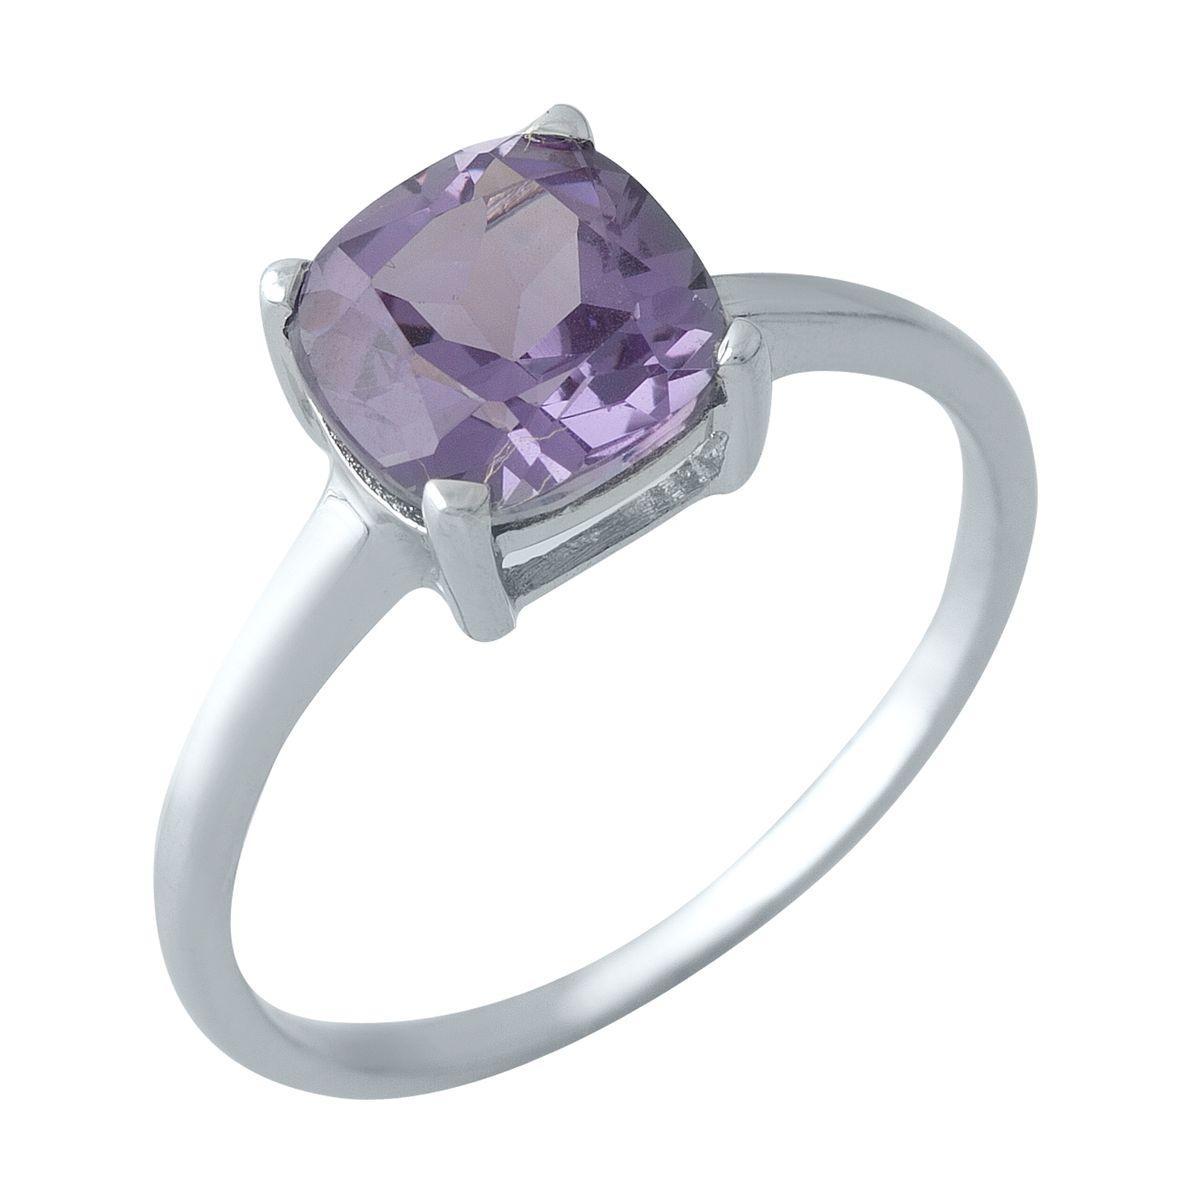 Серебряное кольцо DreamJewelry с олександритом 2.95ct (1971543) 18.5 размер